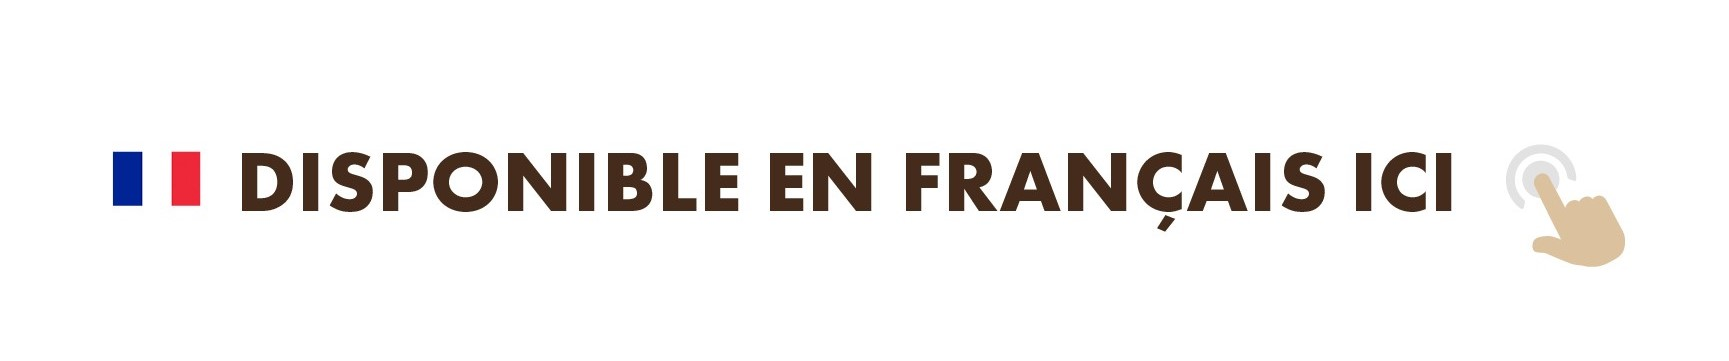 francais 1